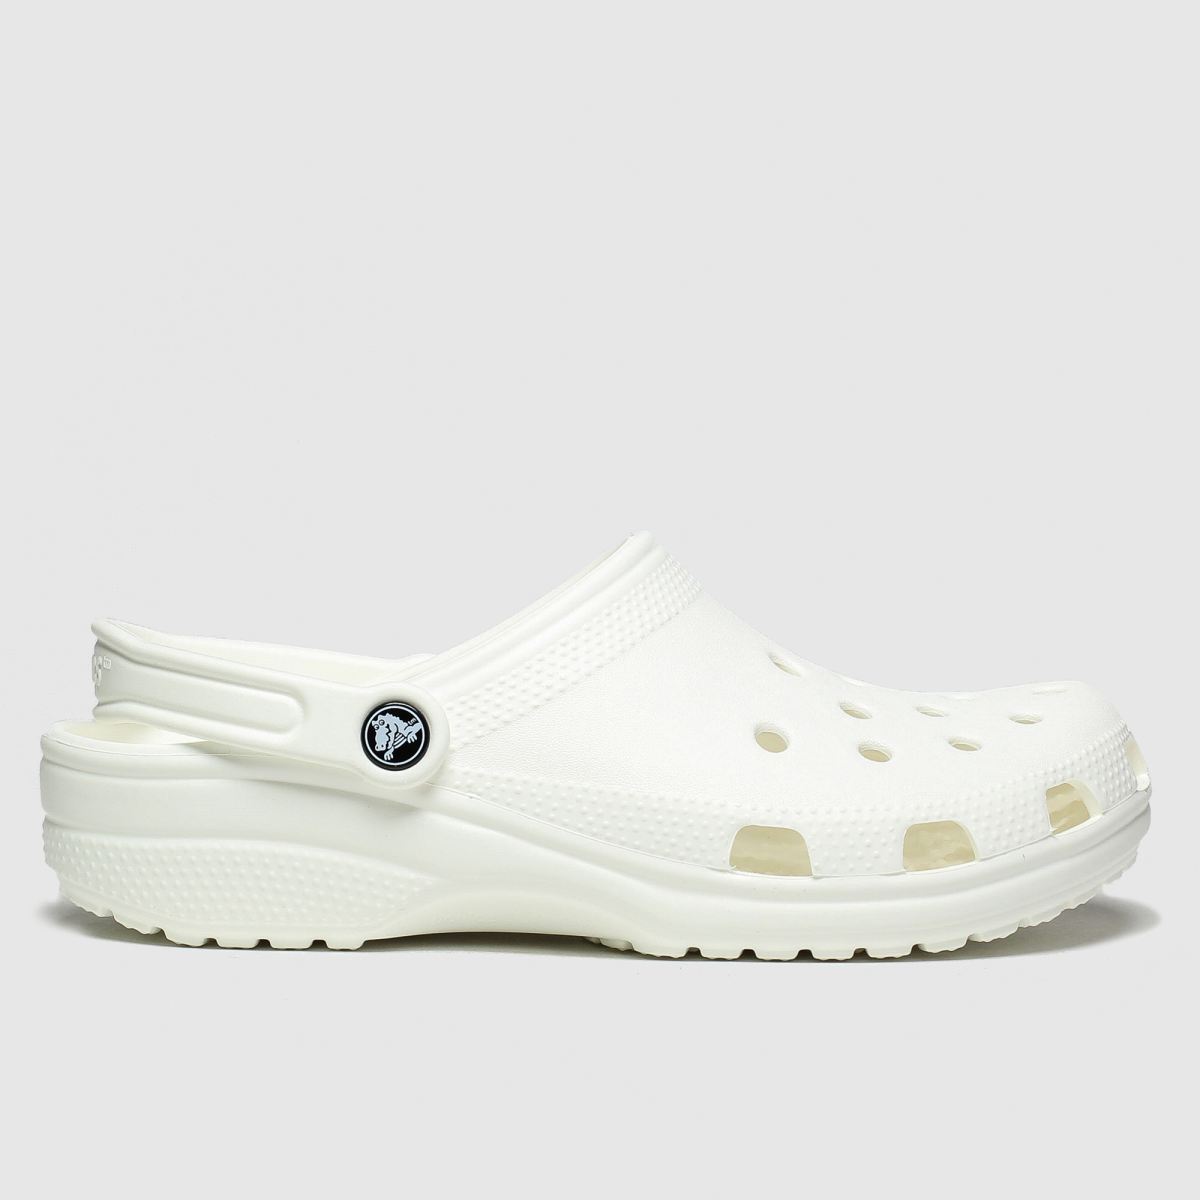 Crocs White Classic Clog Sandals